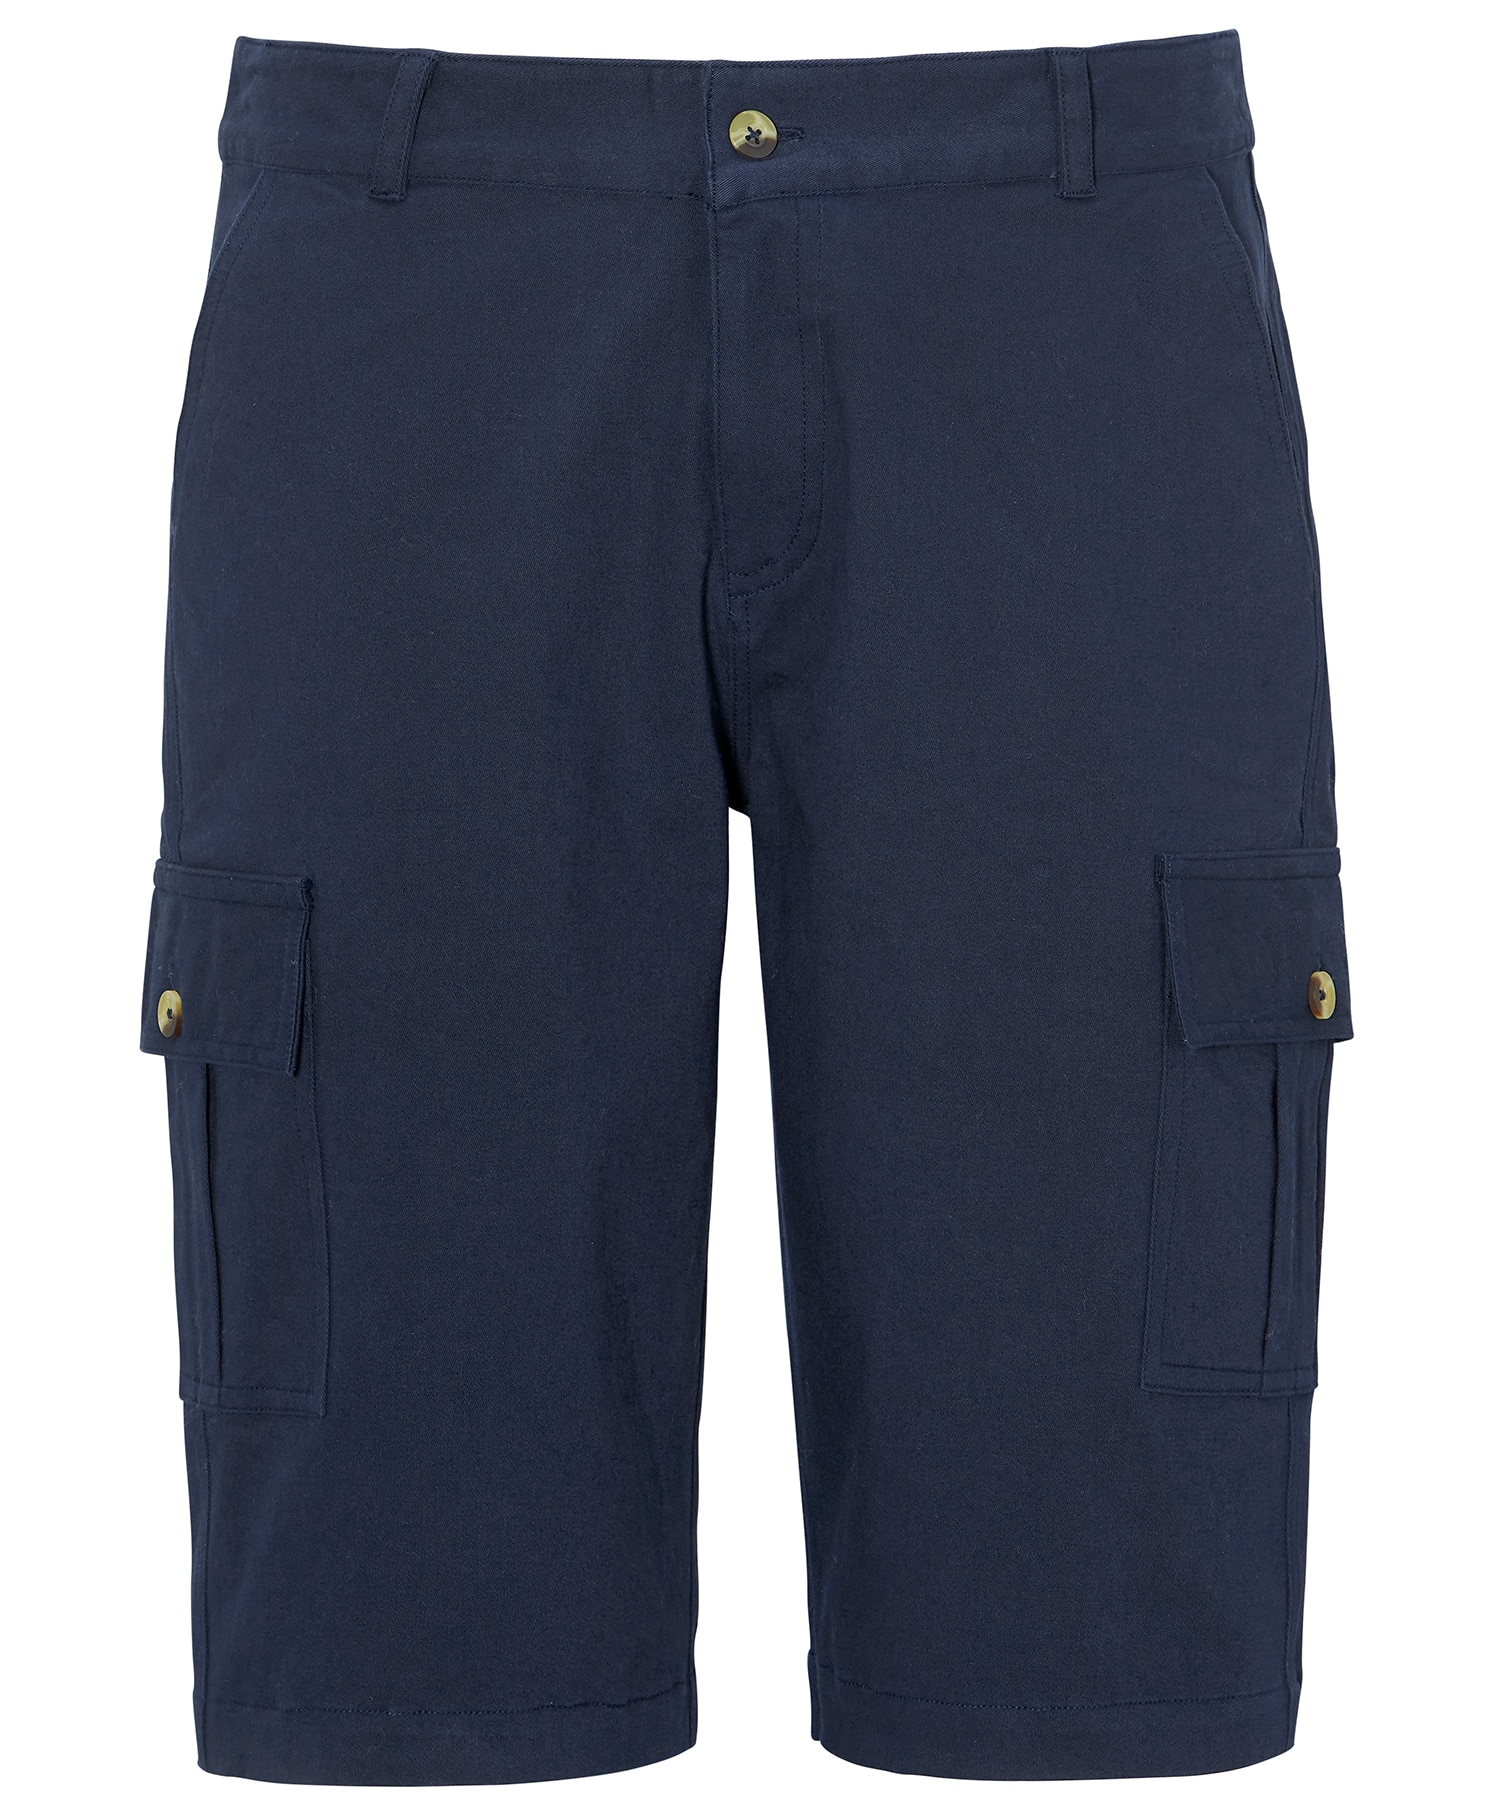 Redhill cargo shorts